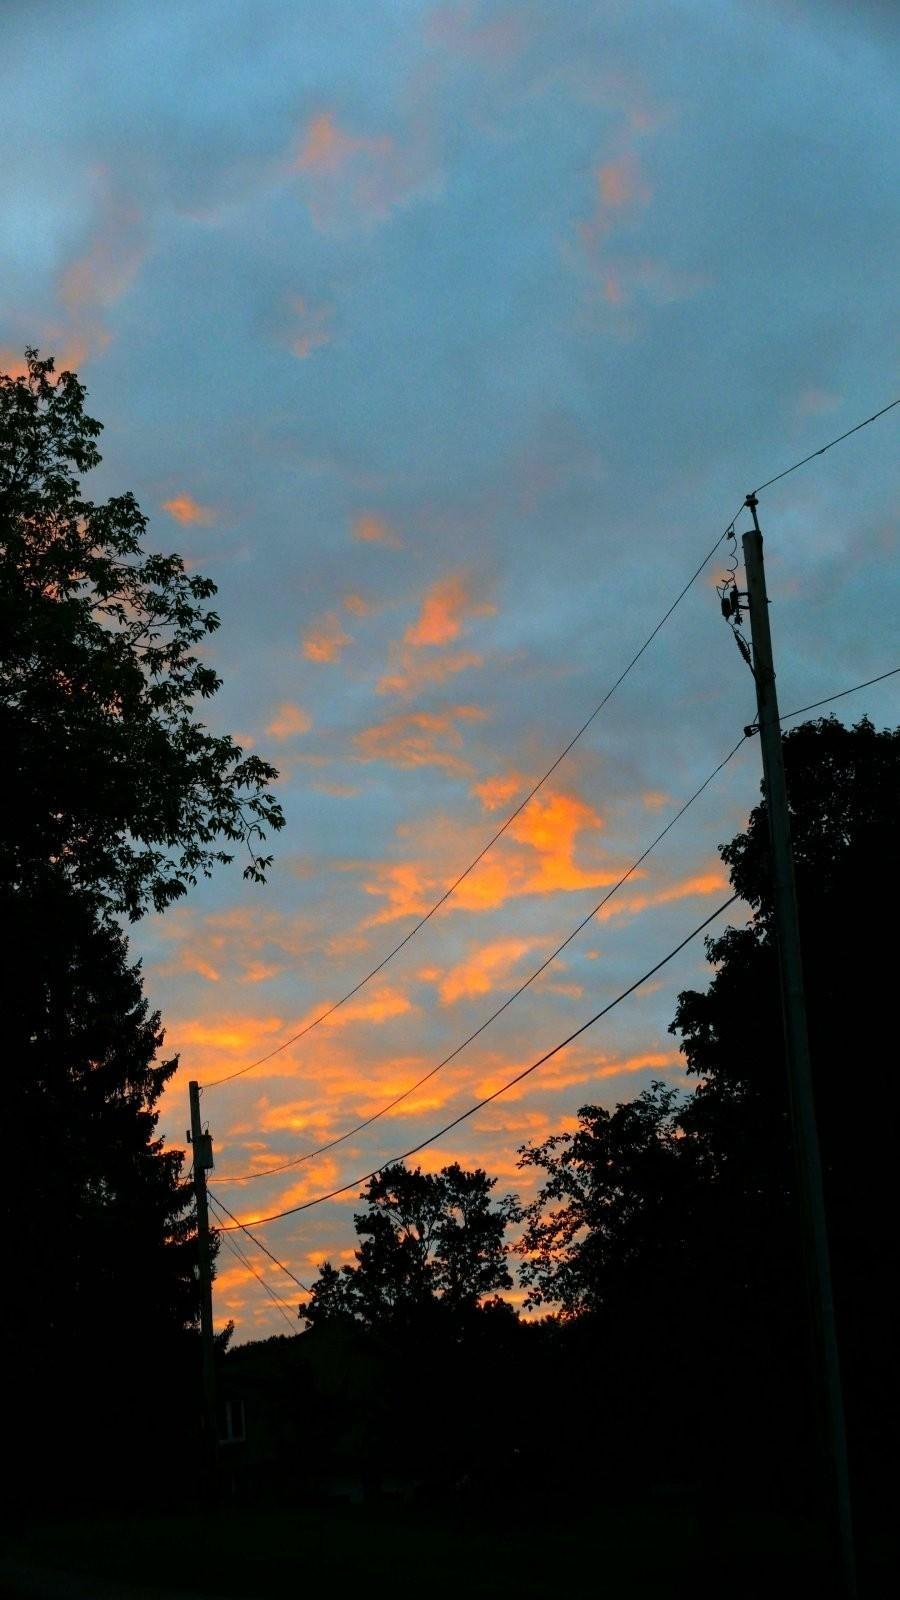 LX100 sunrise pickering lane 004-001.JPG